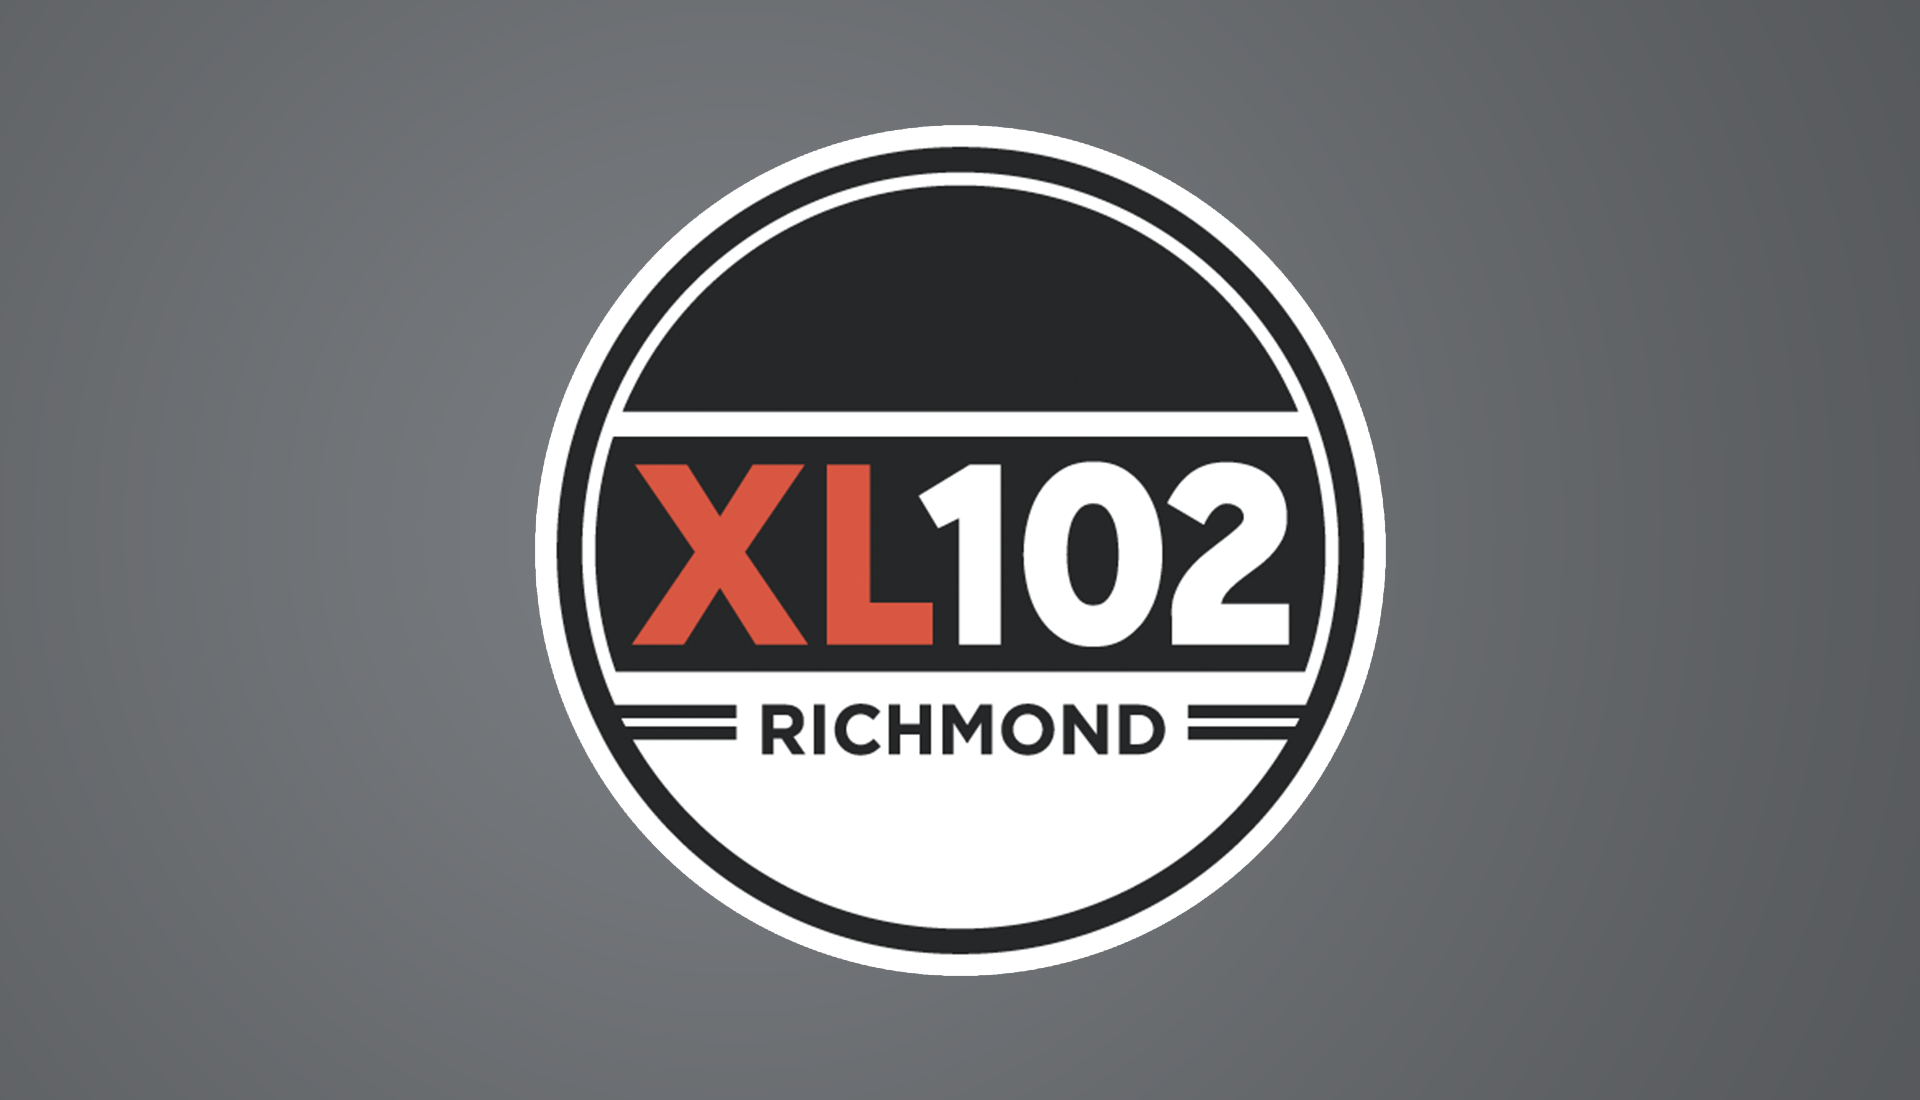 xl102-new-logo.png